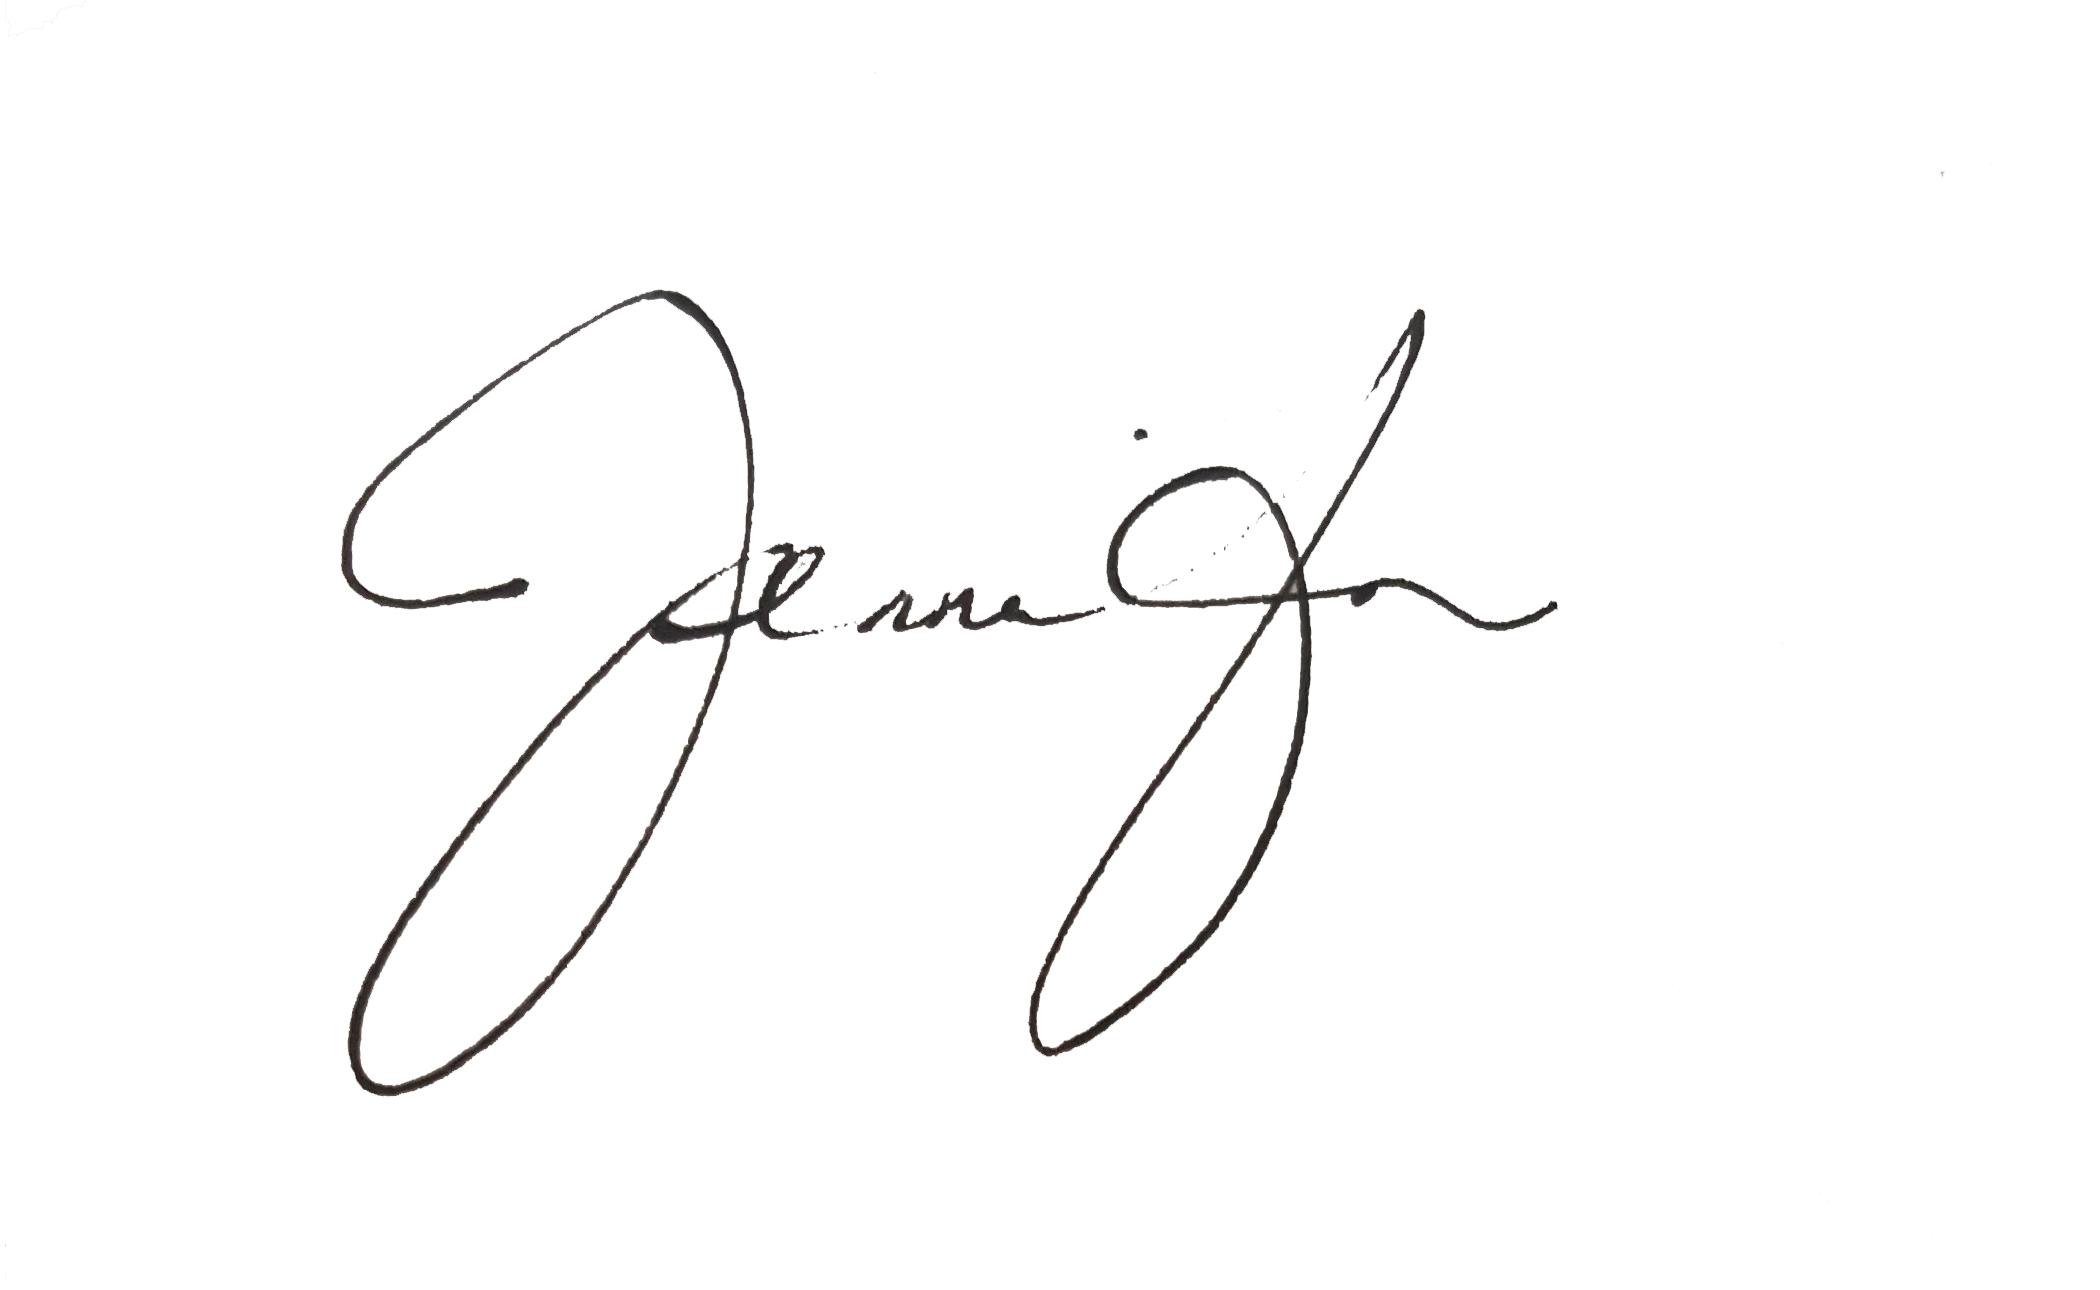 Jennifer M. Gifford's Signature